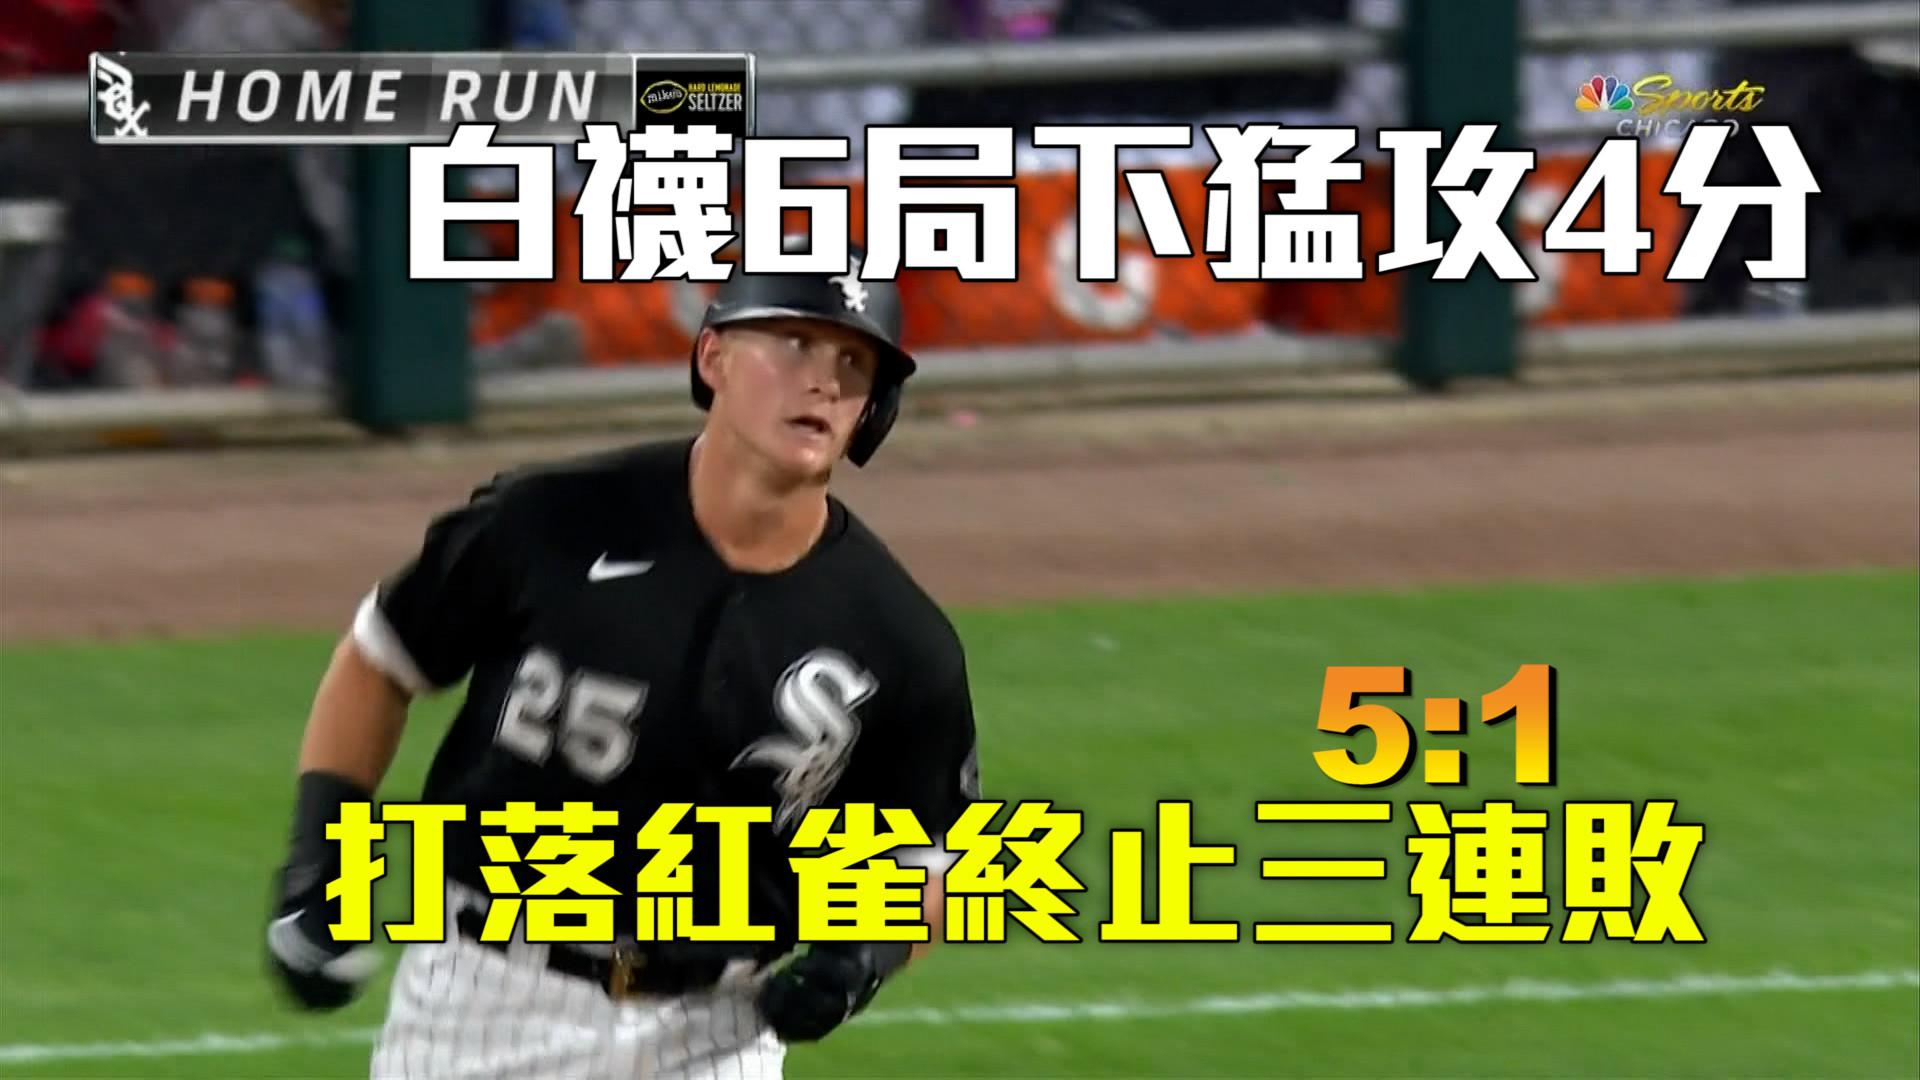 【MLB看愛爾達】六下猛攻4分大局 白襪5:1力克紅雀 05/25